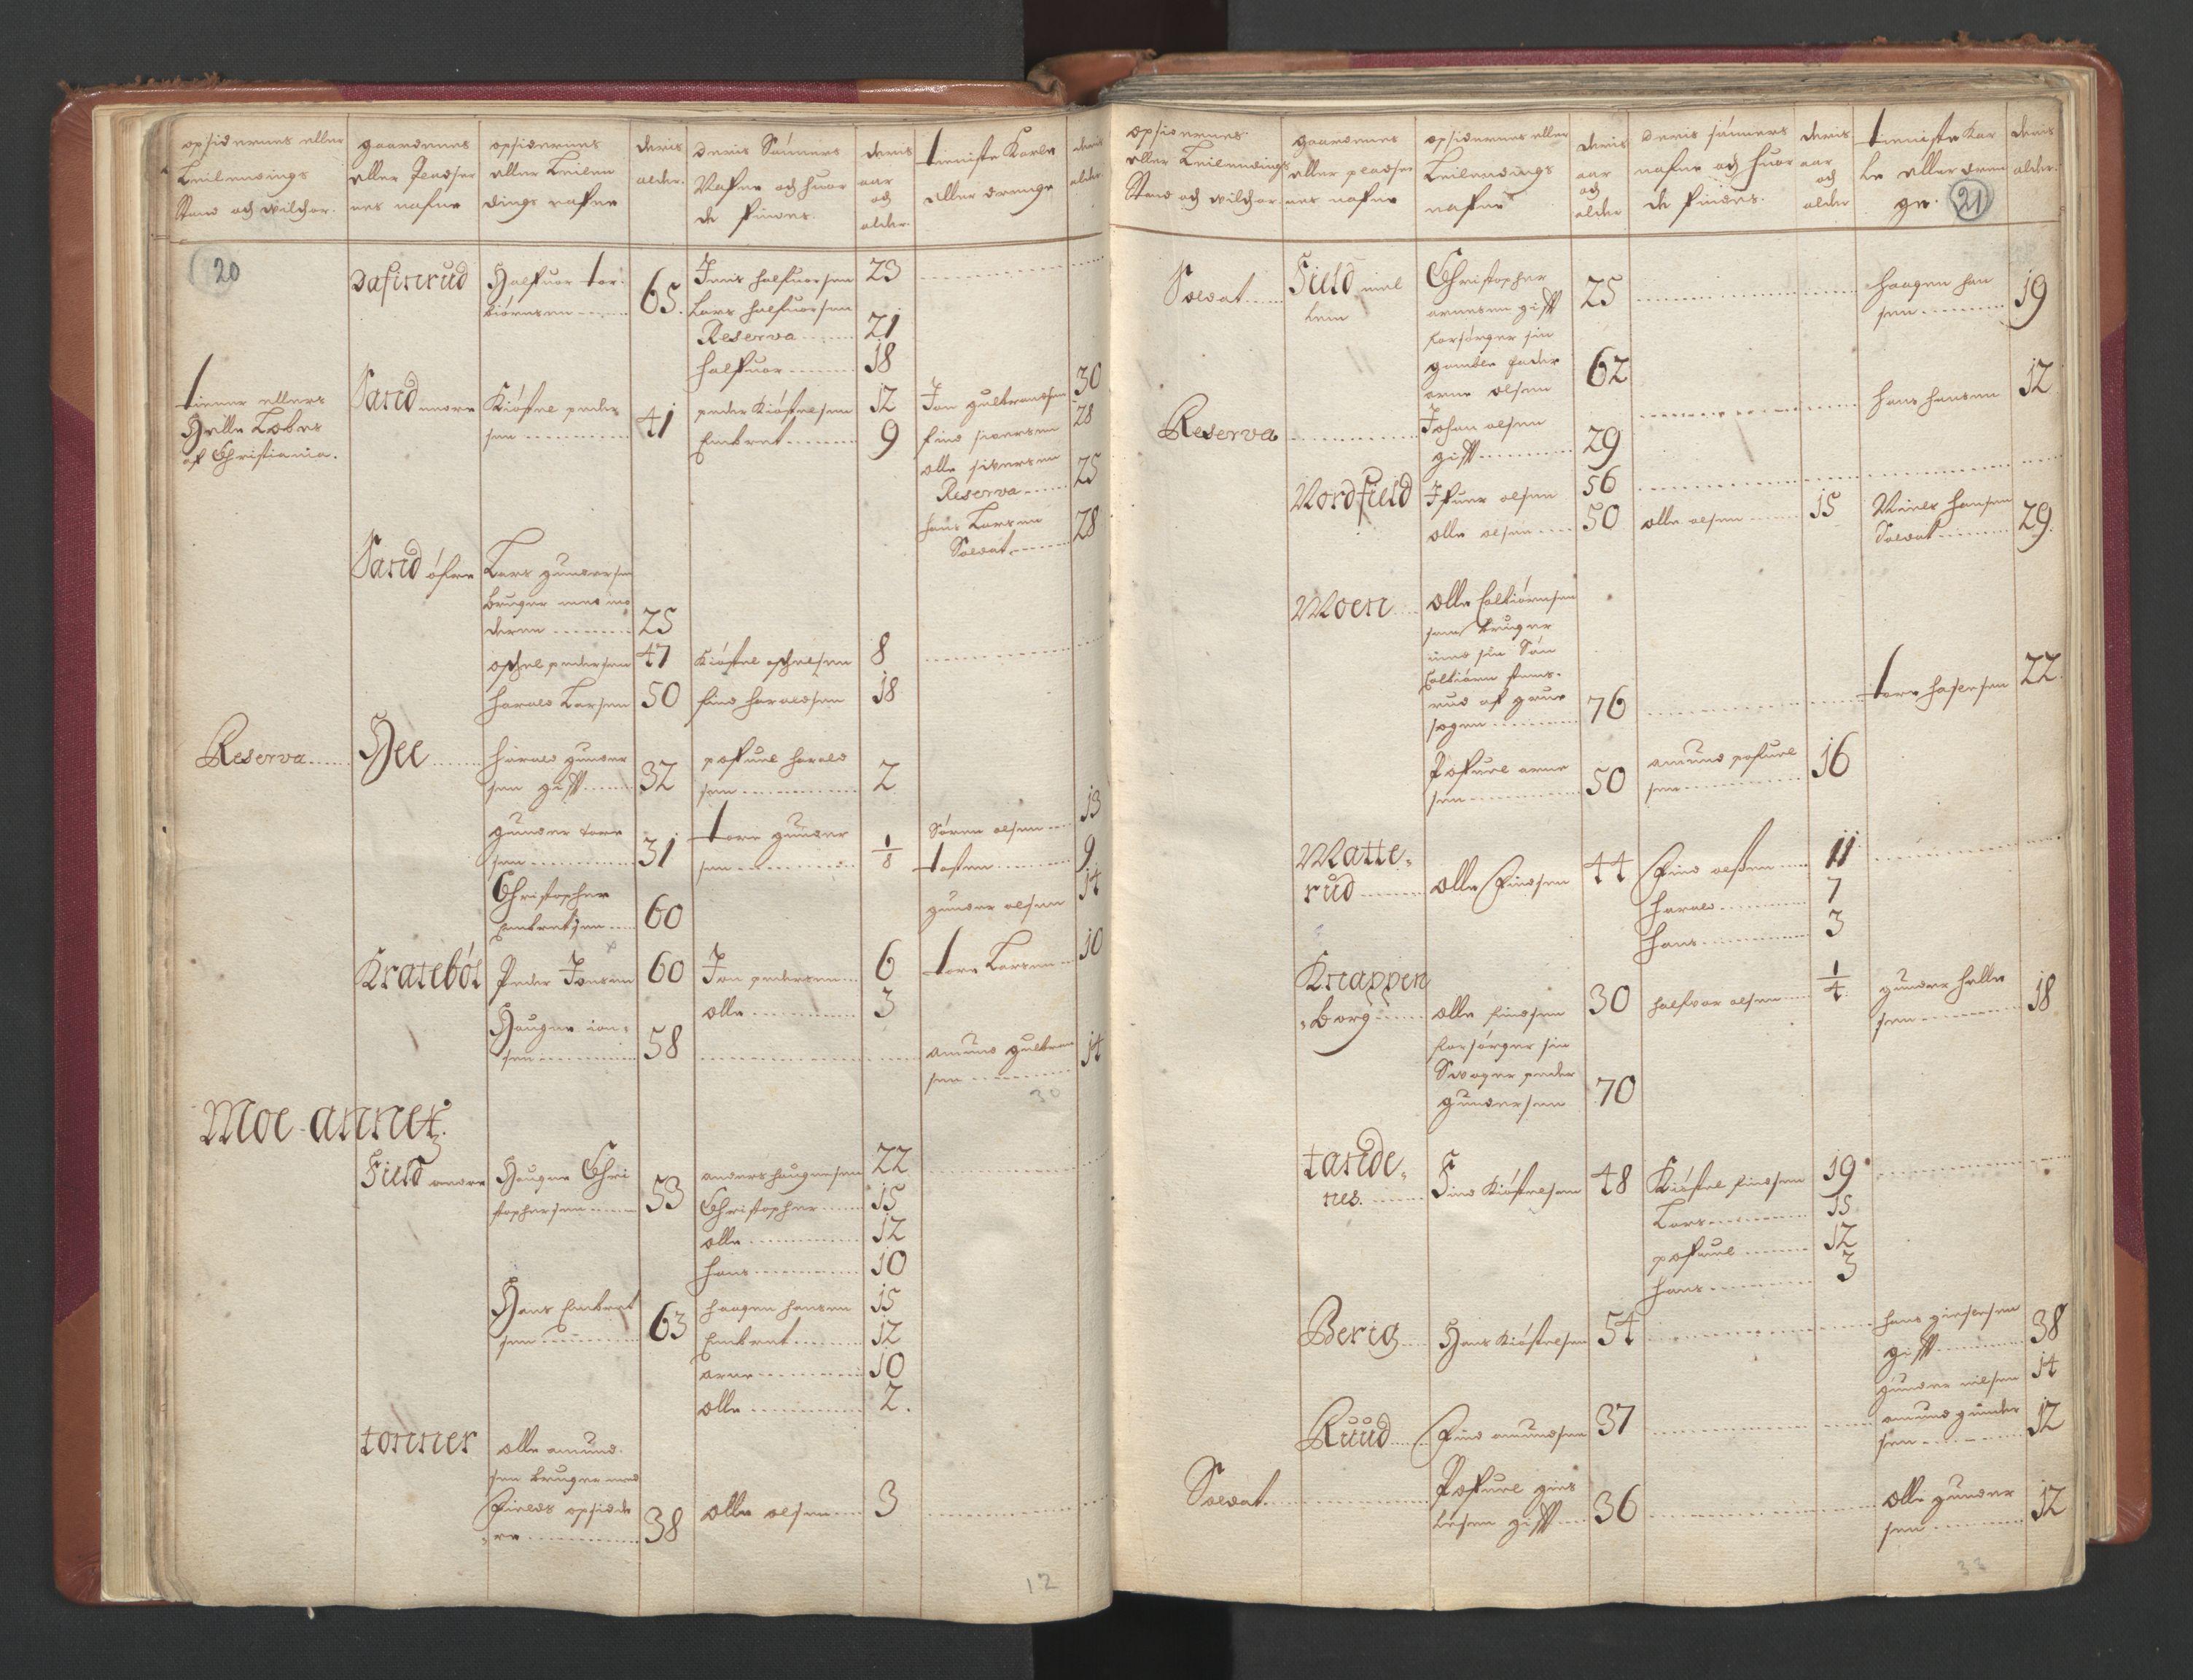 RA, Manntallet 1701, nr. 2: Solør, Odal og Østerdal fogderi og Larvik grevskap, 1701, s. 20-21